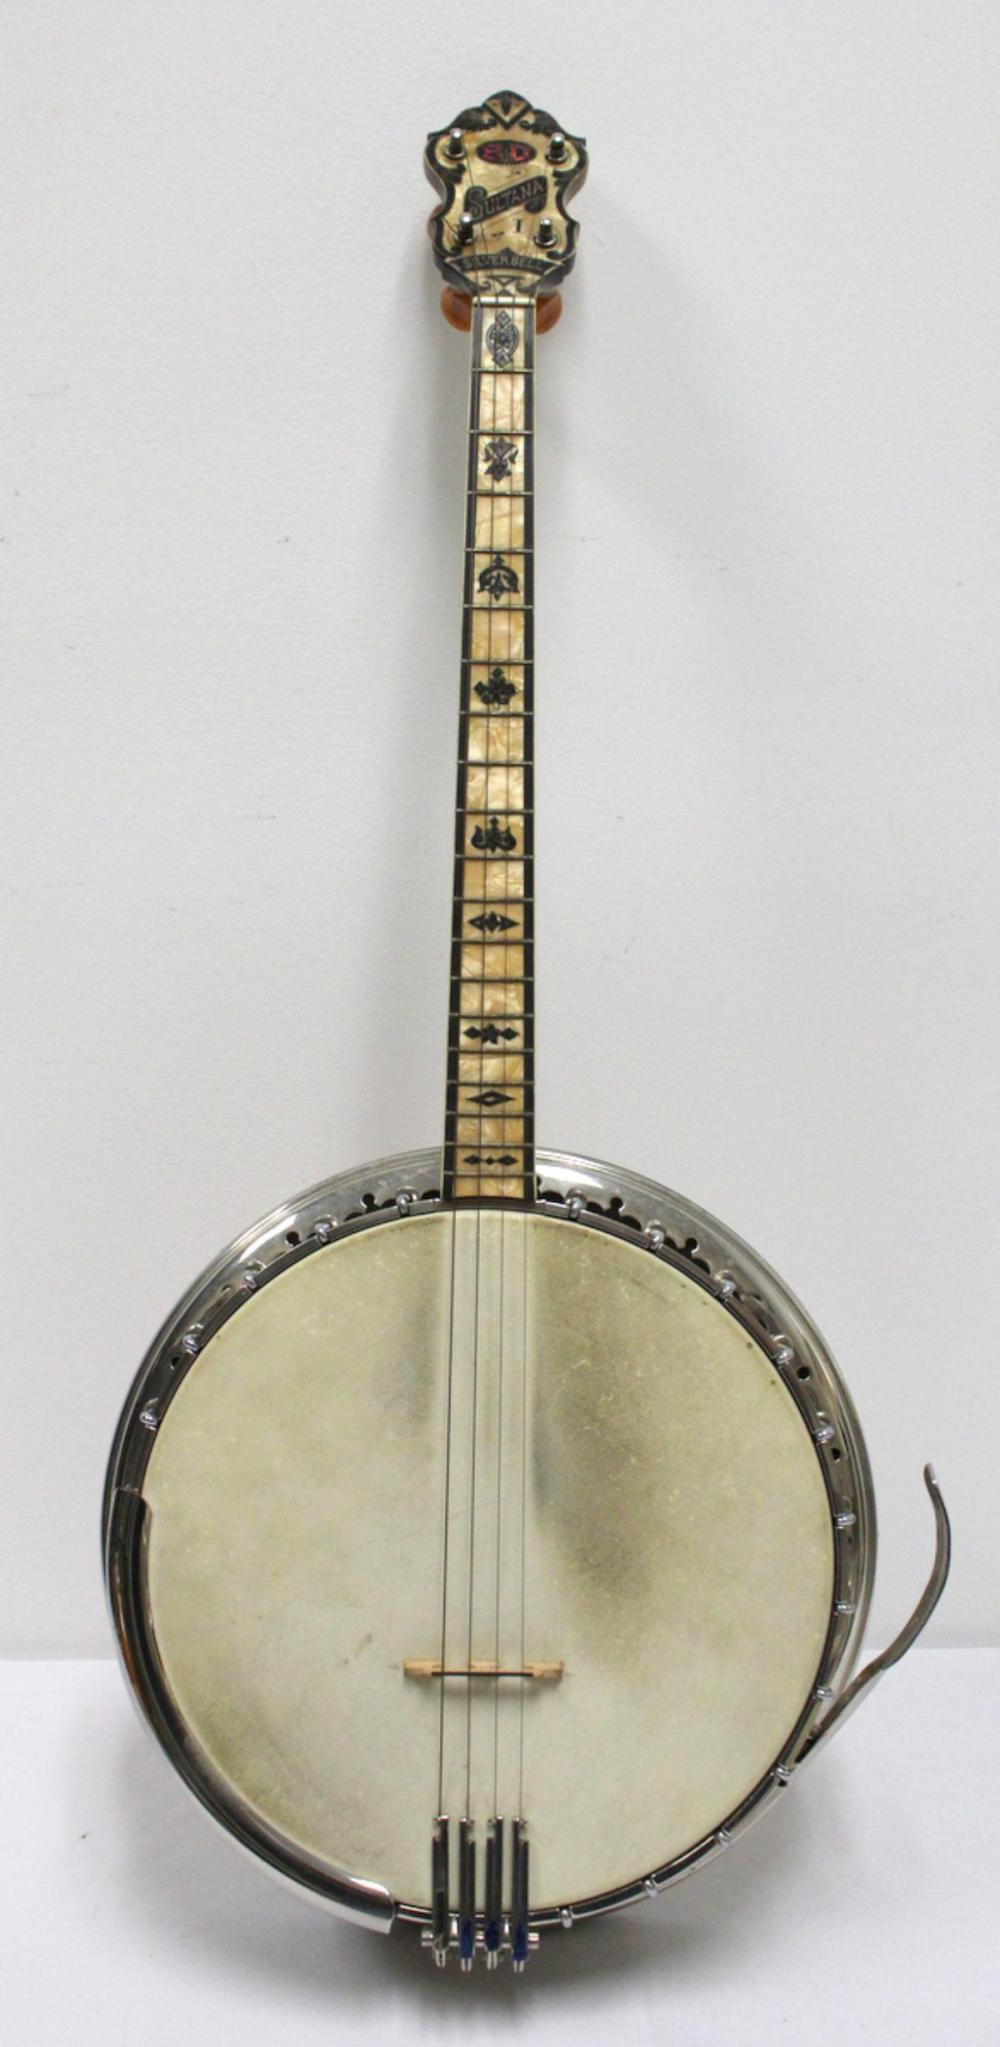 Vintage B&D Sultana Silverbell Tenor Banjo